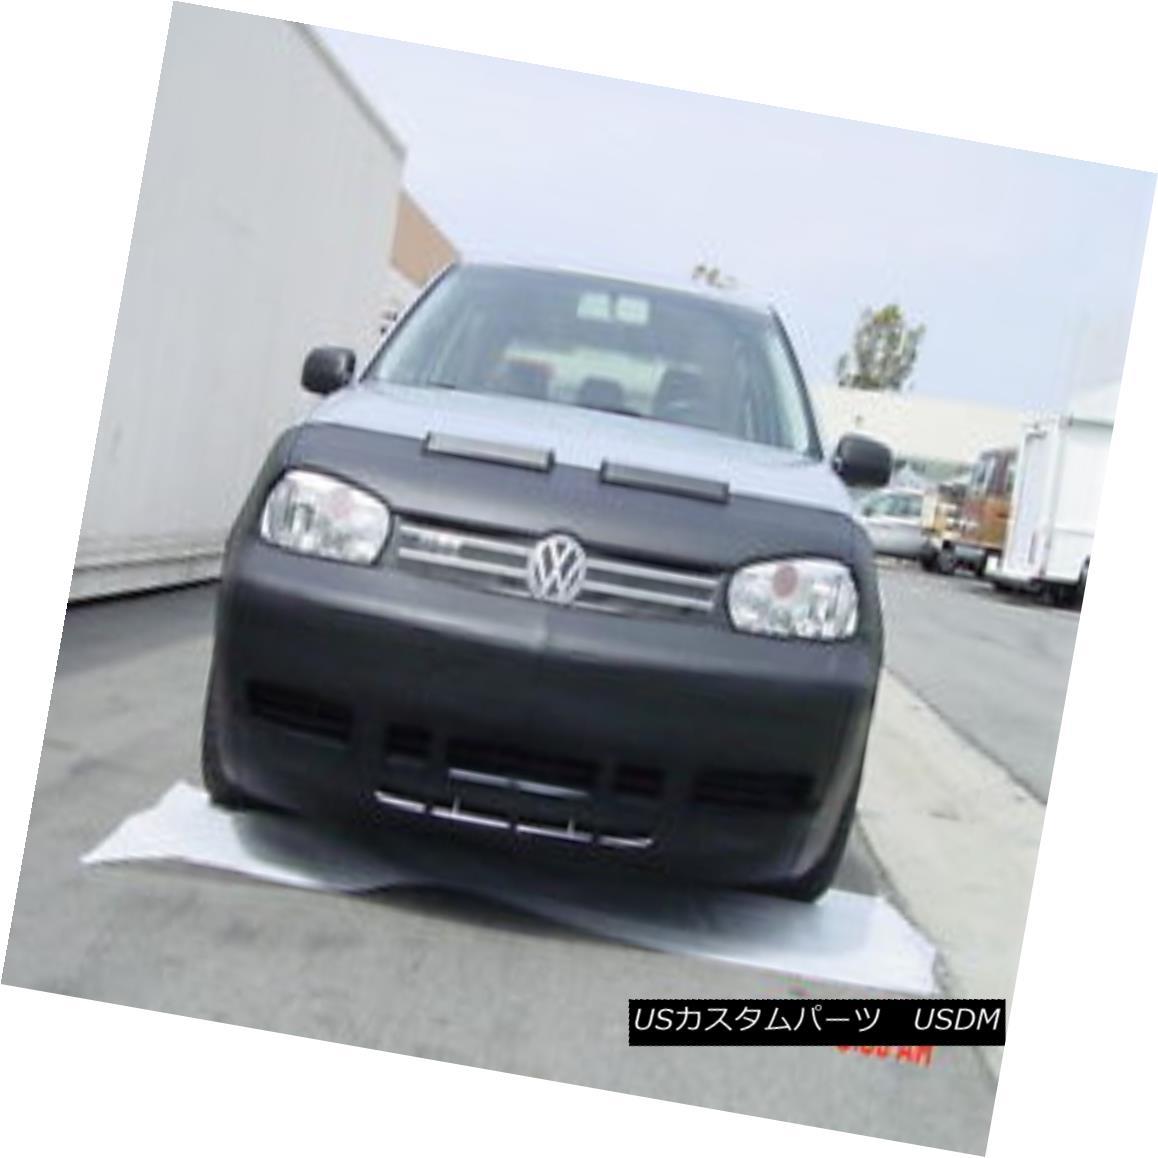 2pc. ノーズブラ VW Front Colgan Oタグ TDI TDI Bra & 1999-2004 Golf, VWゴルフ、GL、GLS、GTI& フルブラ 1999-2004 Tag コルガンフロントエンドマスクブラ2pc / Fits W/O End W GL,GLS,GTI Mask